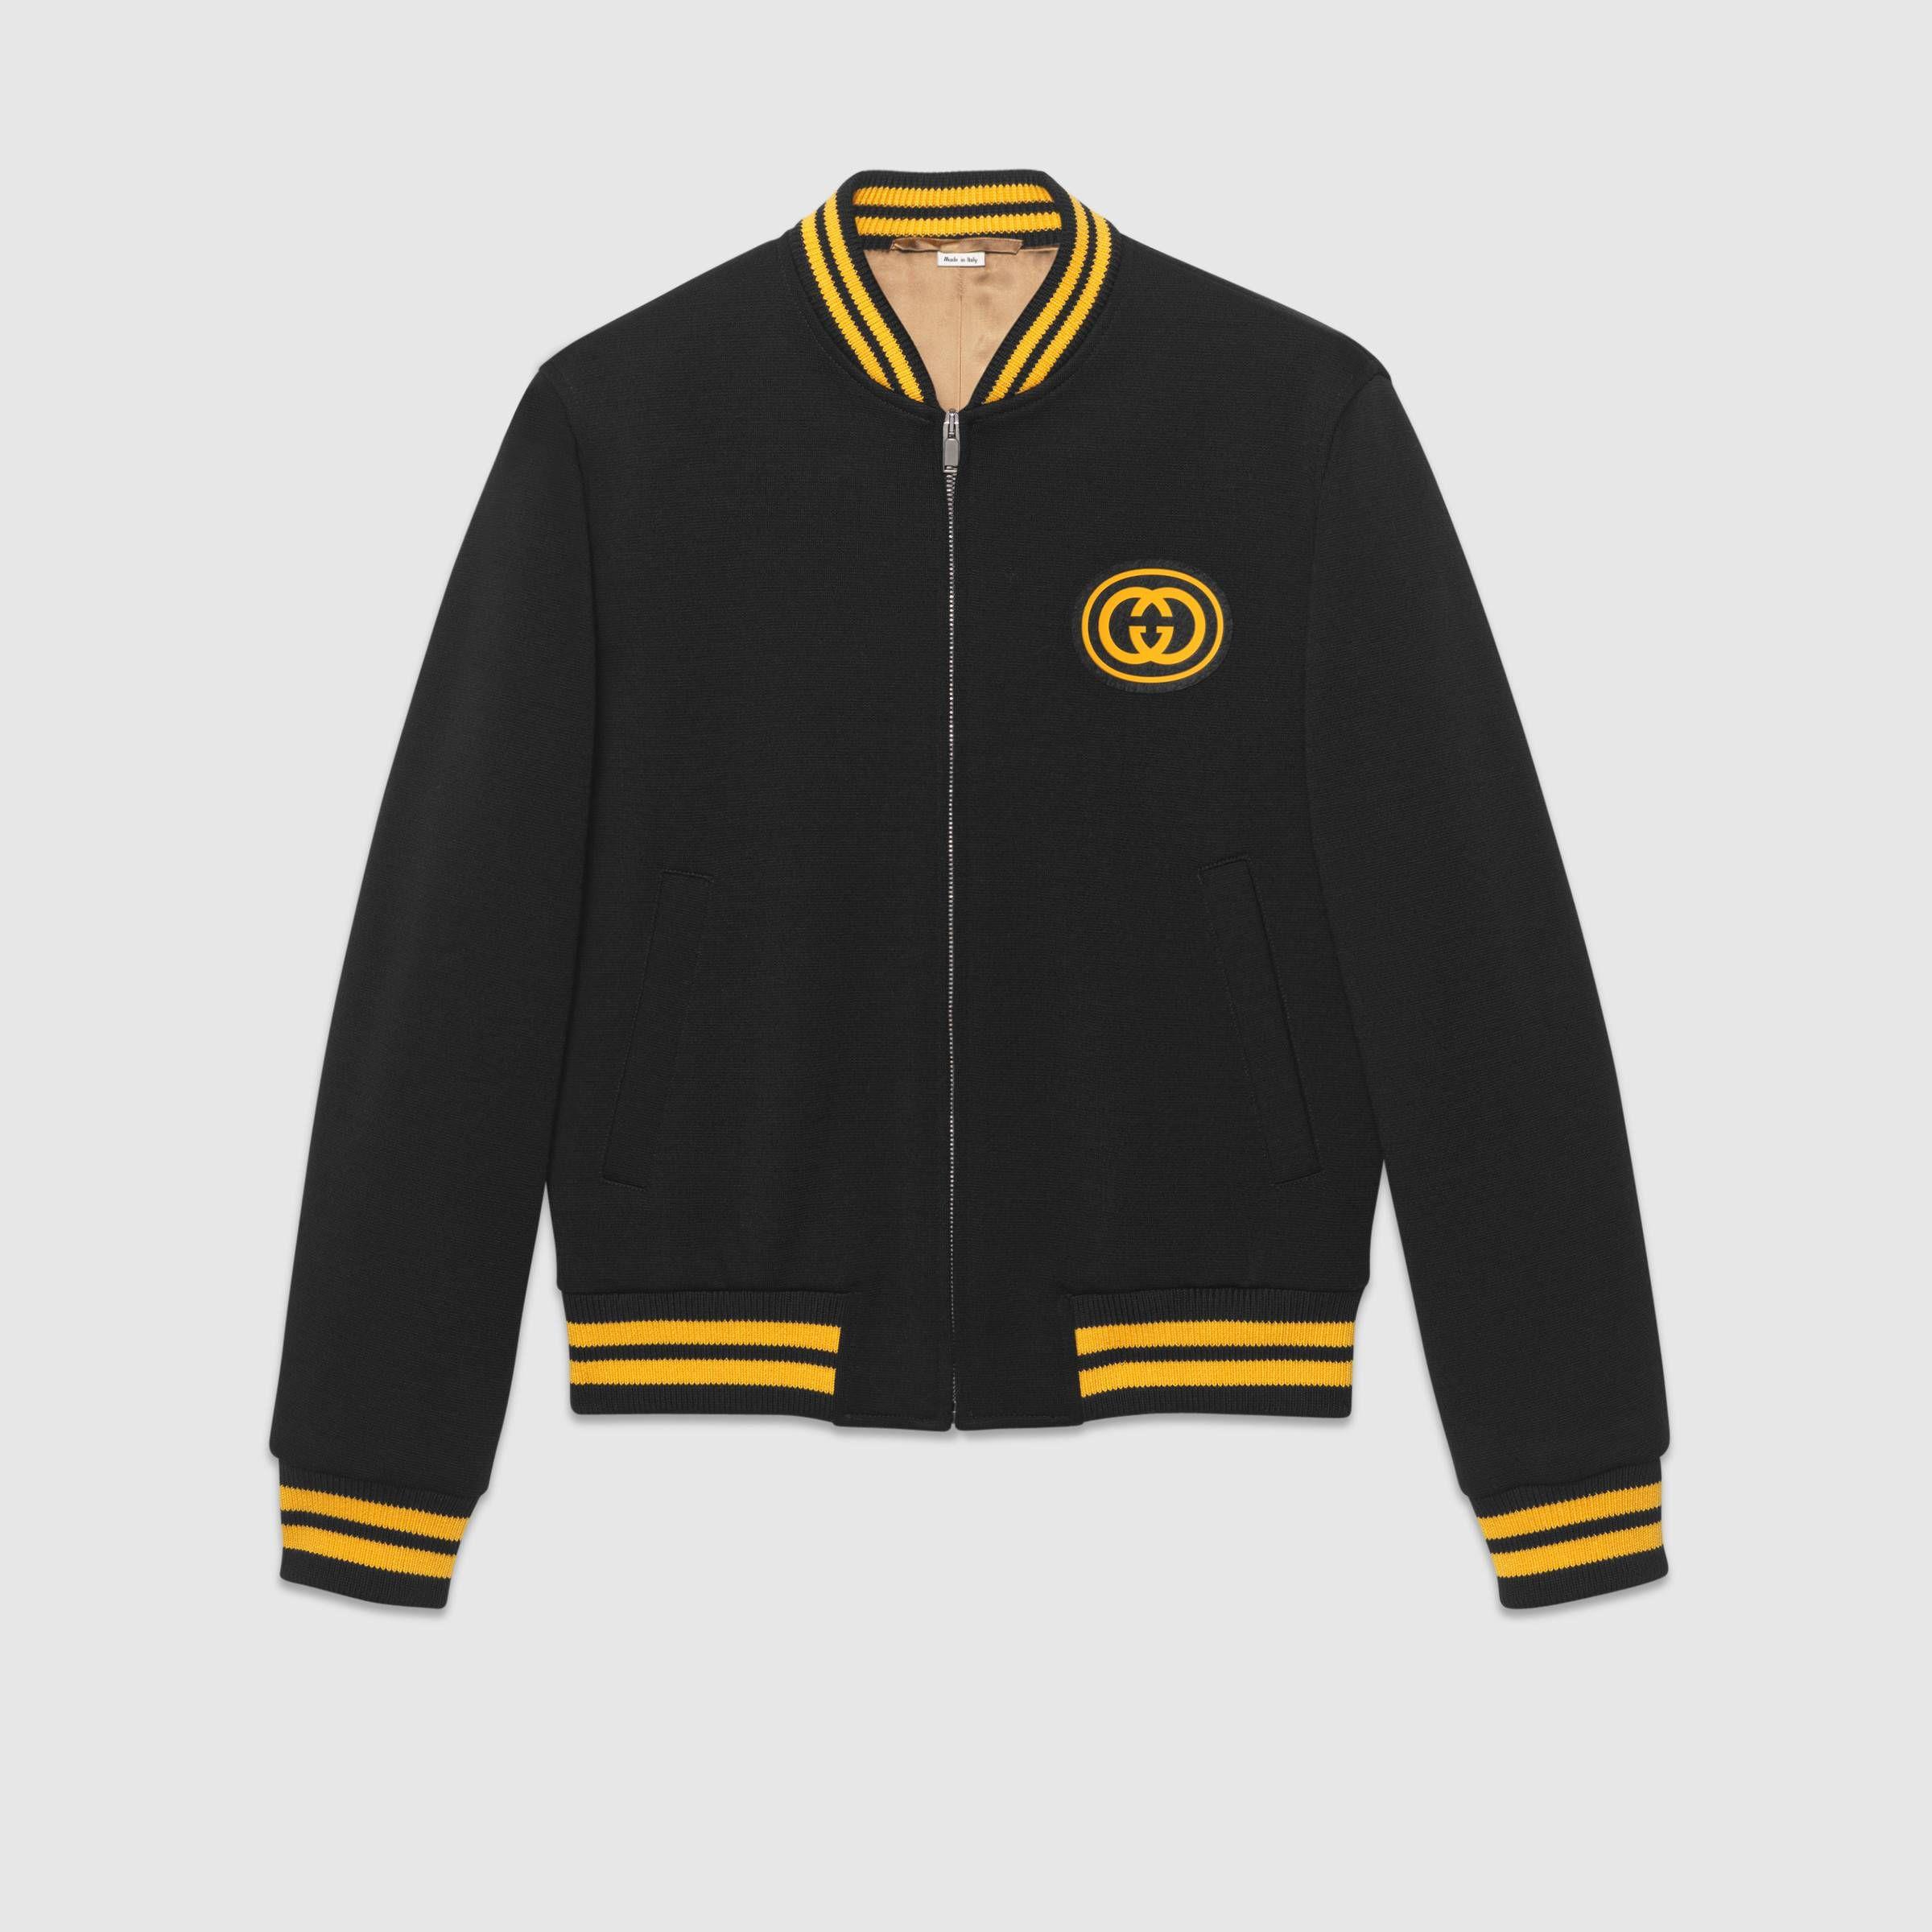 Bomber Jacket With Interlocking G In Black Wool Jersey Gucci Men S Bombers Bomber Jacket Mens Jackets Casual Varsity Jacket [ 2400 x 2400 Pixel ]